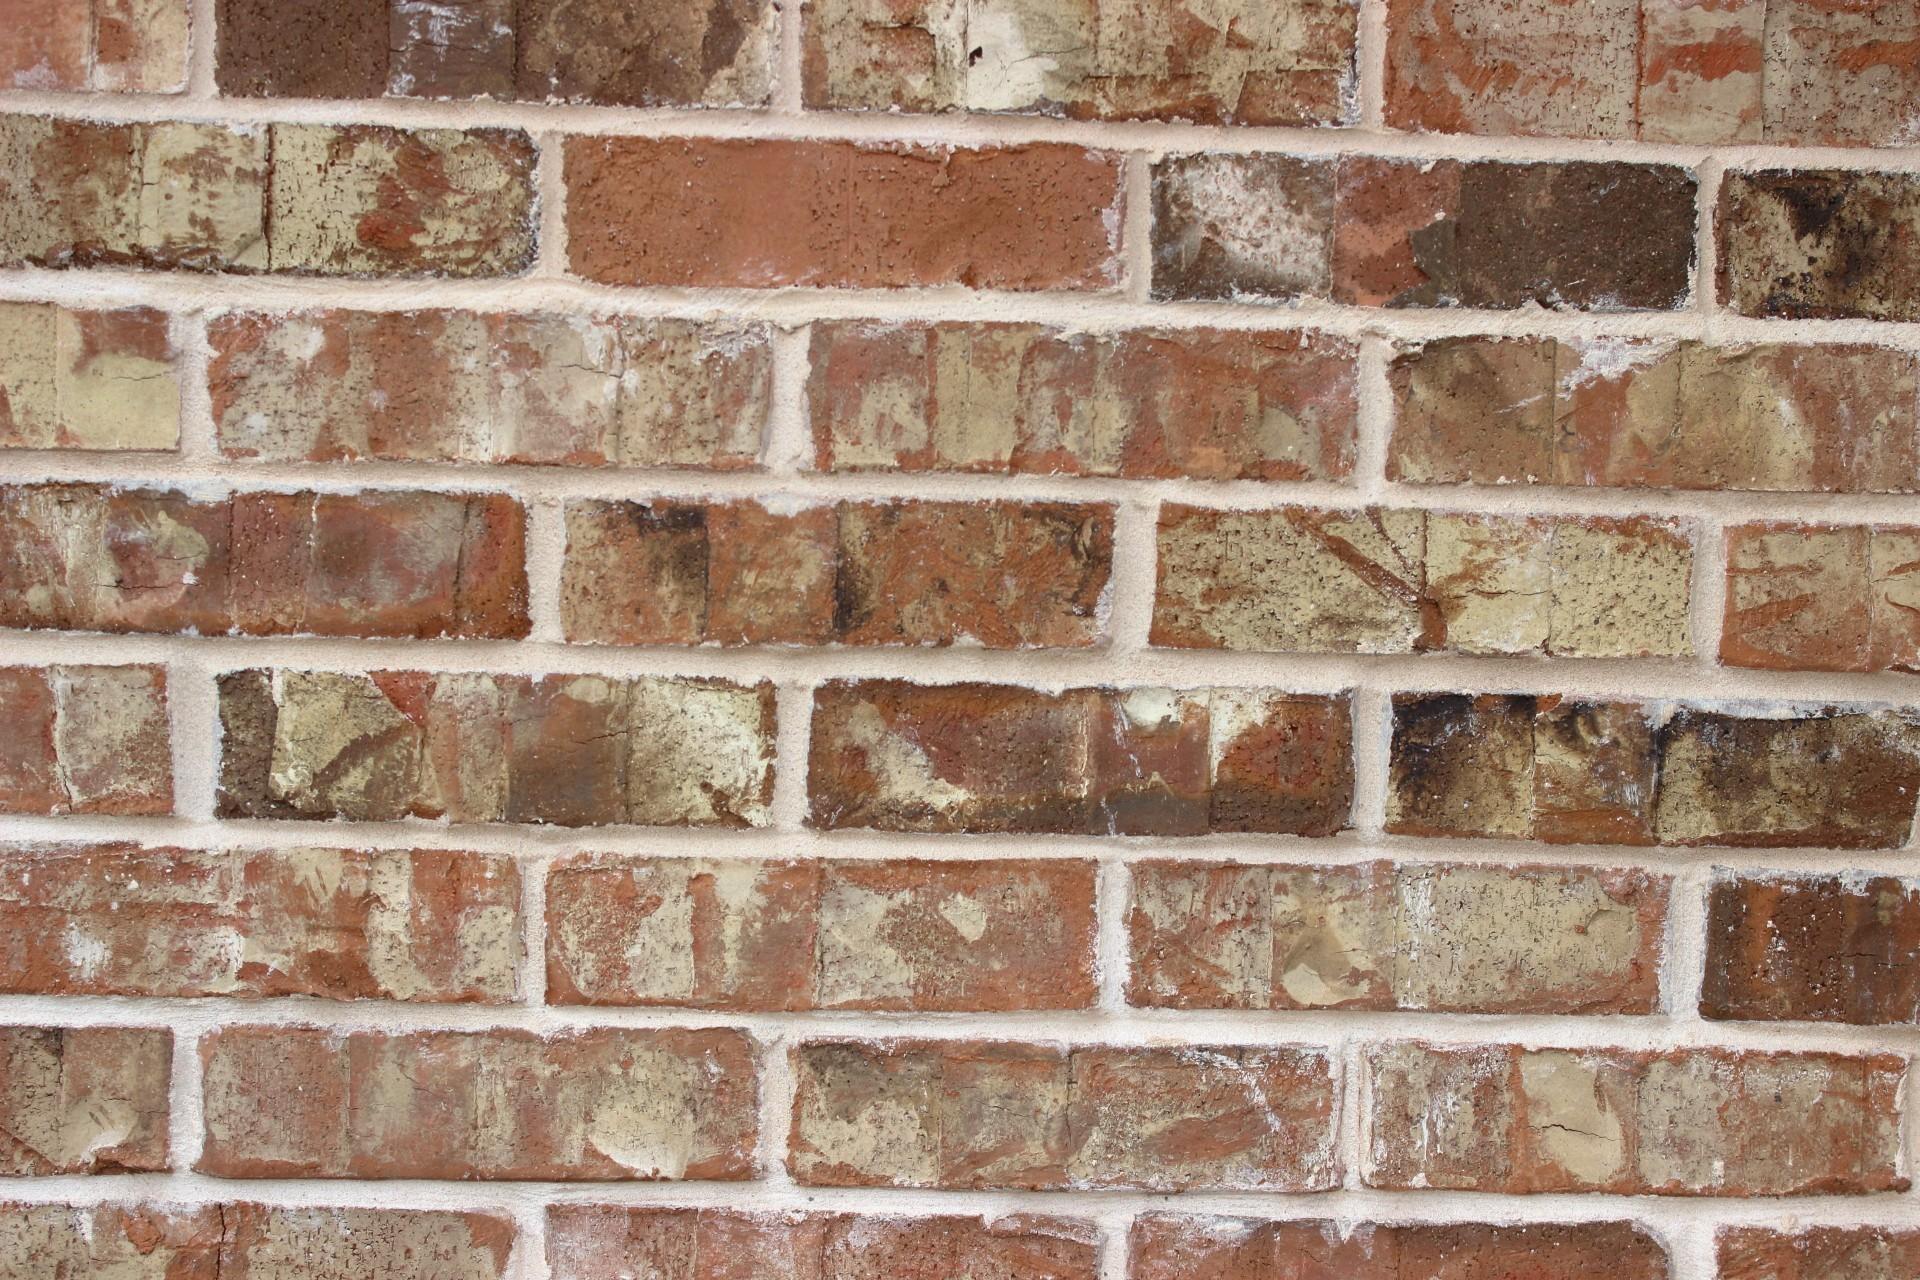 The Torrington Brick